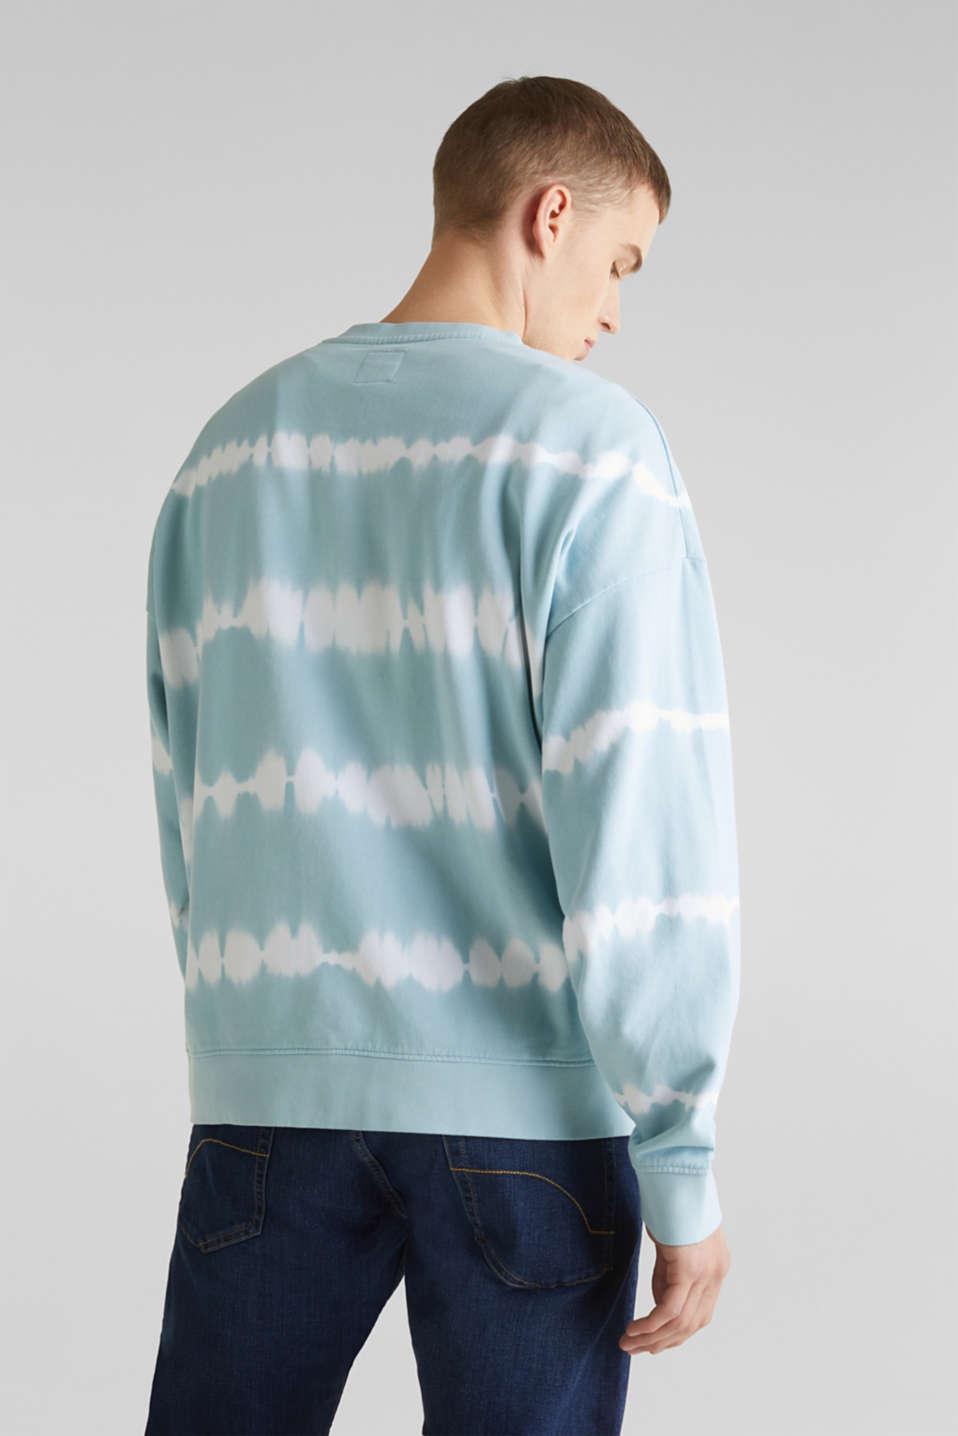 Batik sweatshirt with organic cotton, LIGHT BLUE 4, detail image number 3